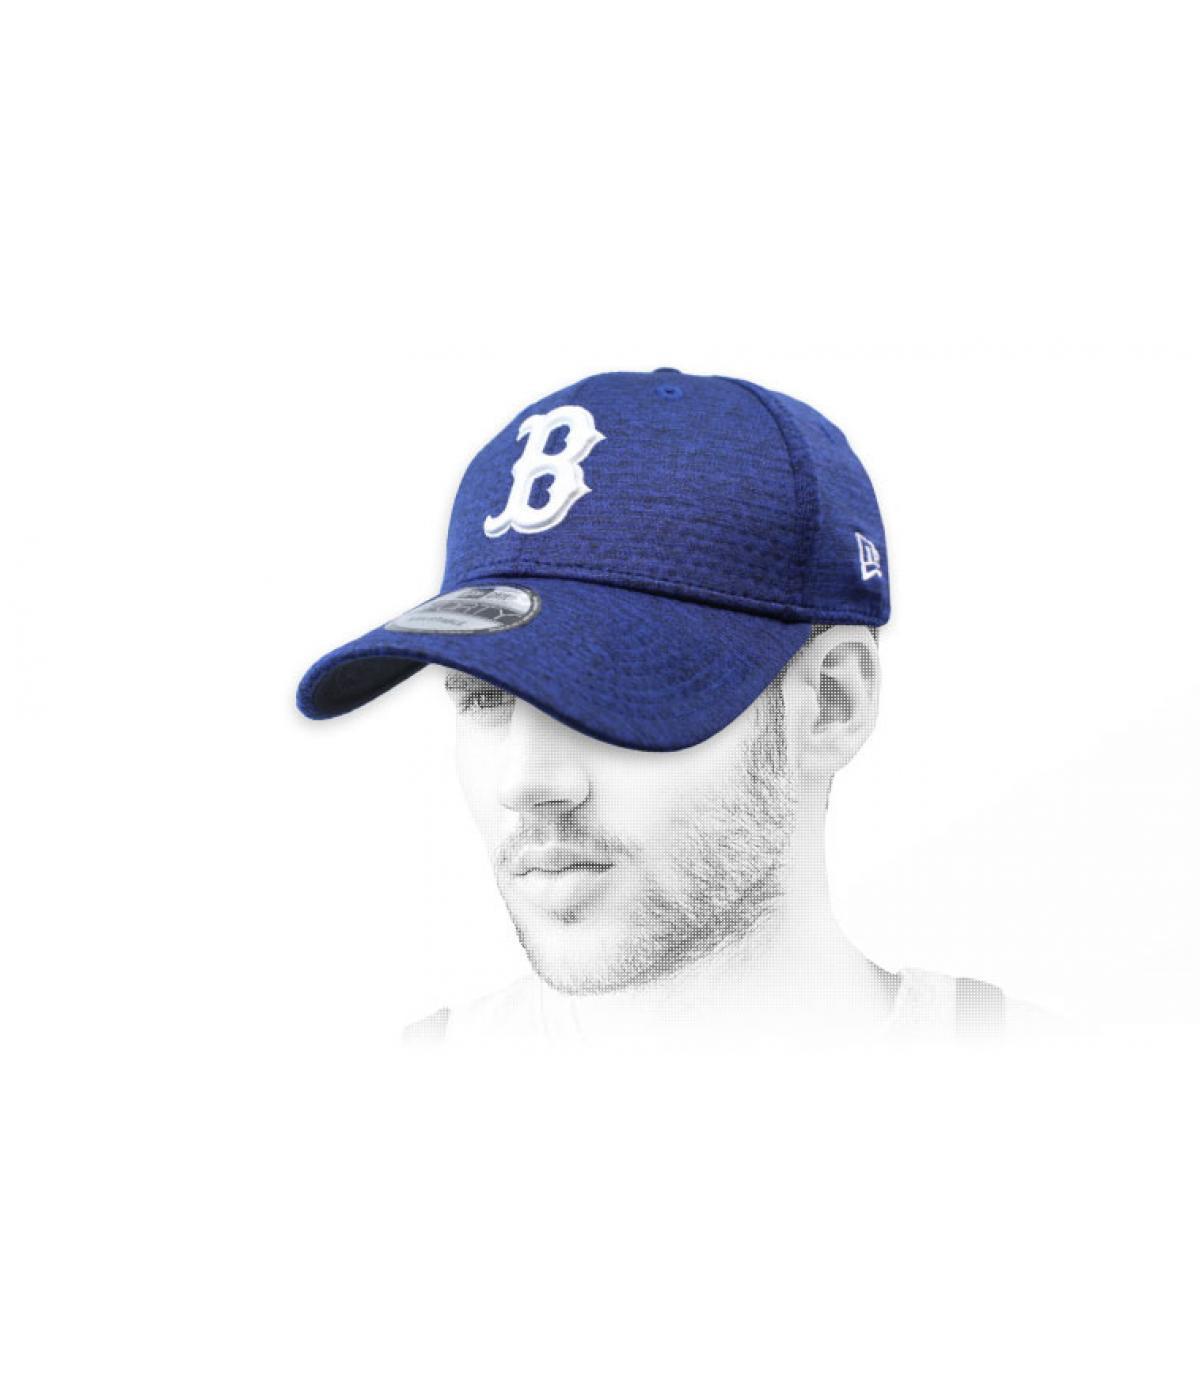 blue B cap Dry Switch